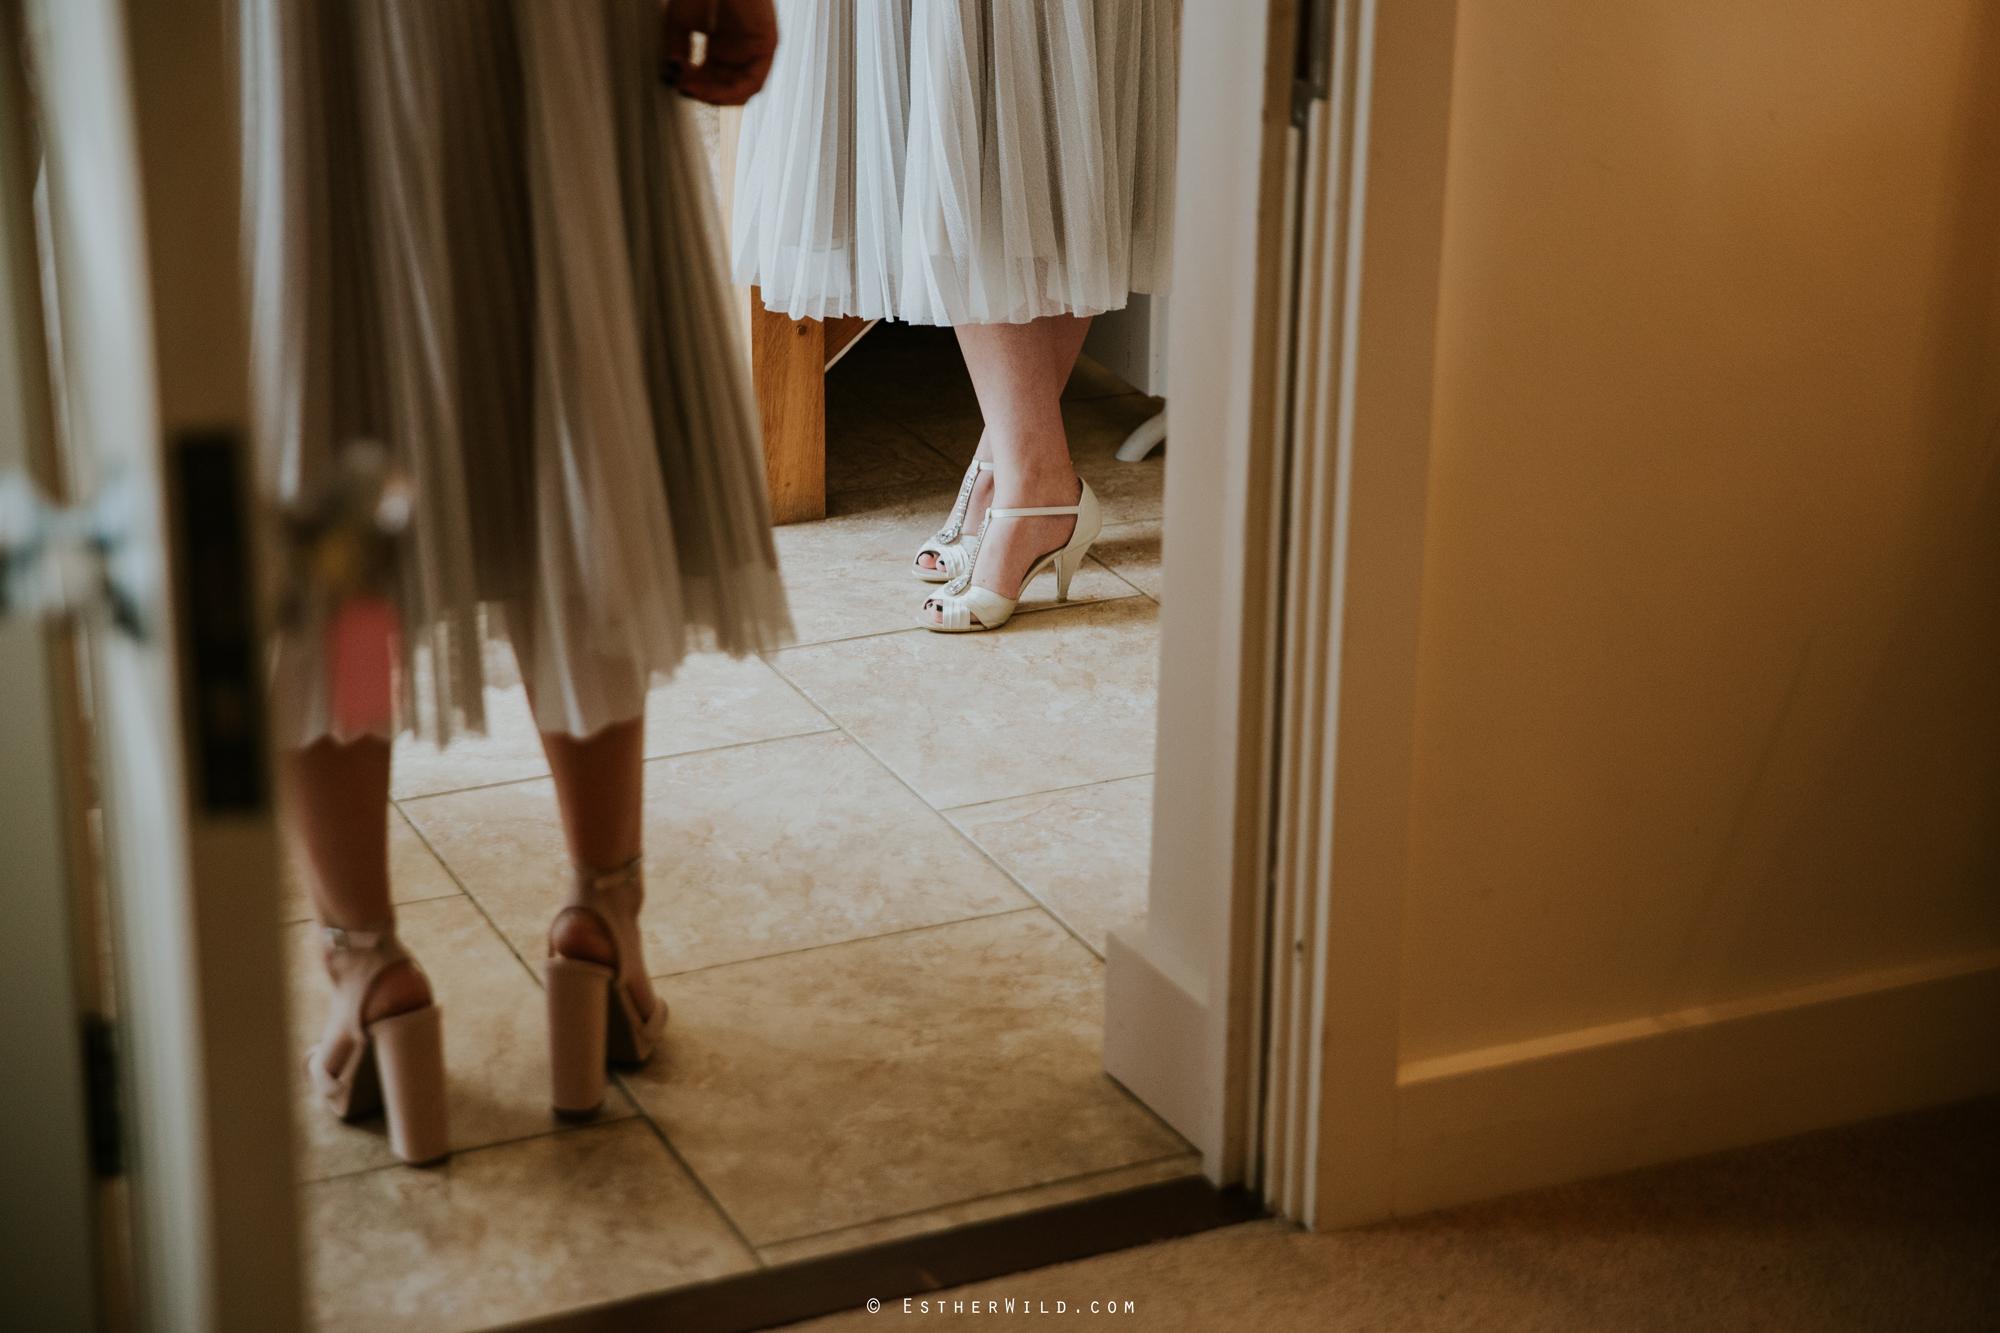 Elms_Barn_Weddings_Suffolk_Photographer_Copyright_Esther_Wild_IMG_0574.jpg